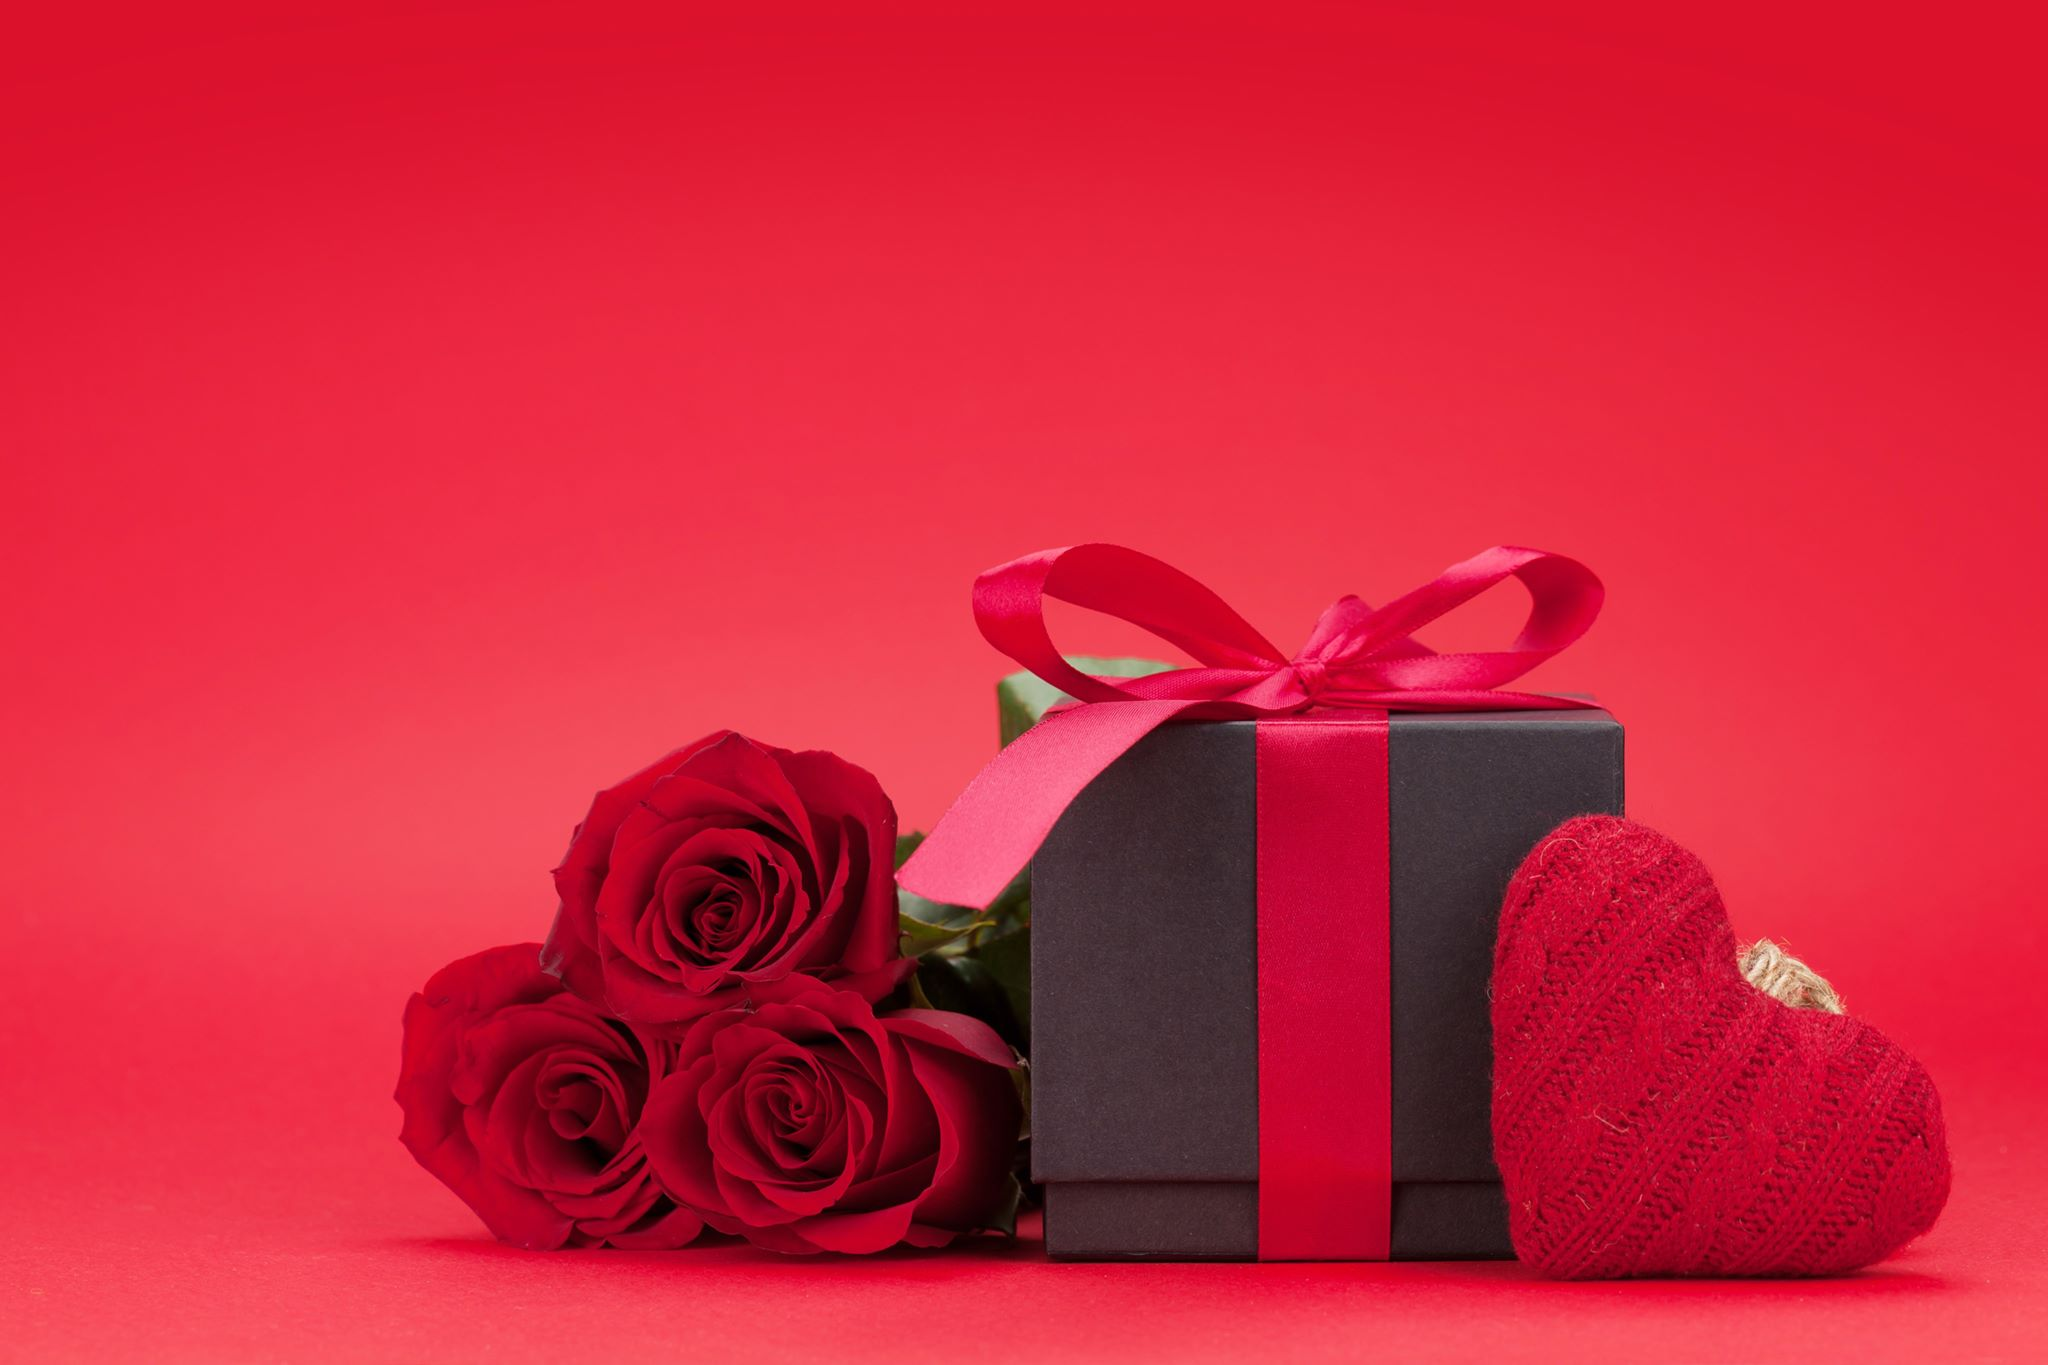 Valentines day images 27 صور عيد الحب